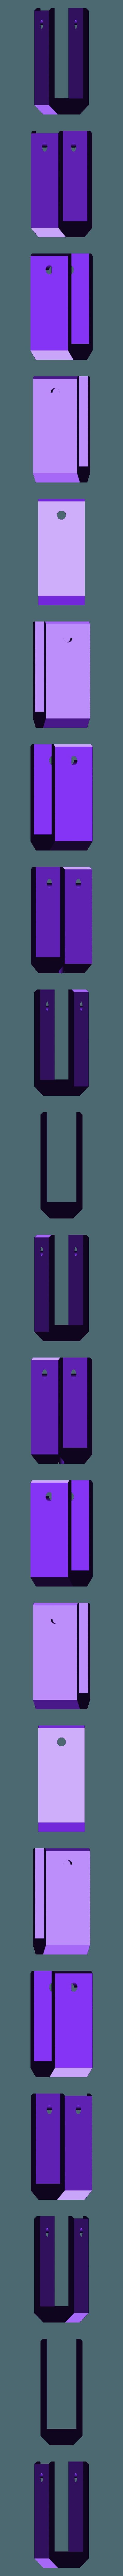 X_axis_belt_tensioner.stl Download free STL file FDM Printer de Kleine Reus 300x300x900 • 3D printable object, Job